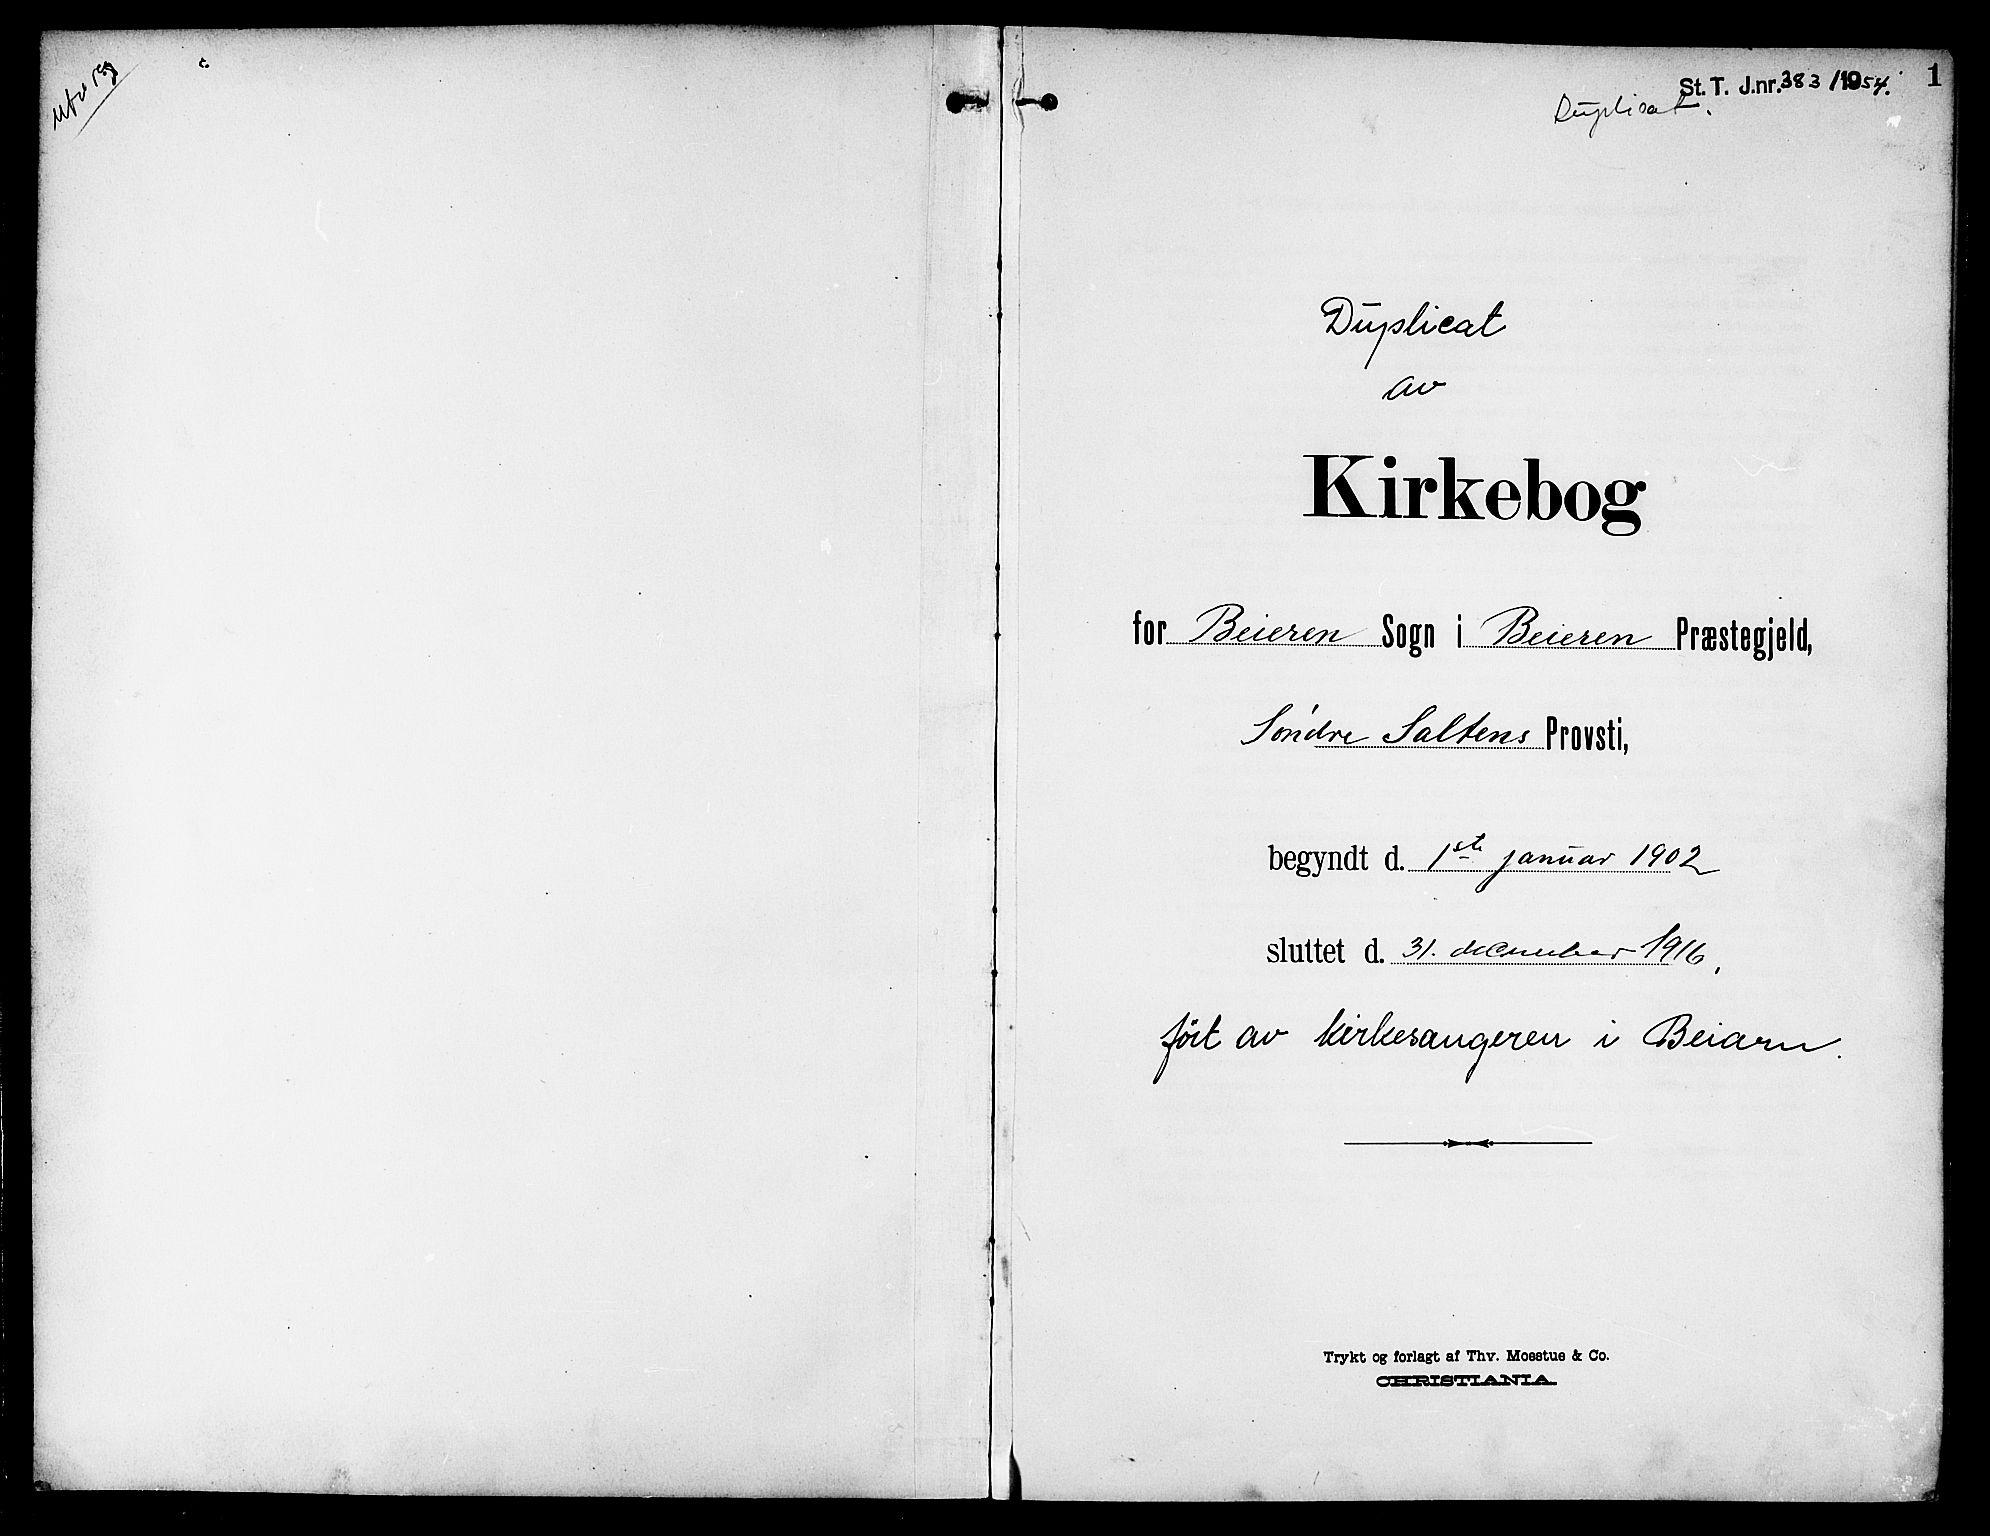 SAT, Ministerialprotokoller, klokkerbøker og fødselsregistre - Nordland, 846/L0647: Klokkerbok nr. 846C05, 1902-1916, s. 1